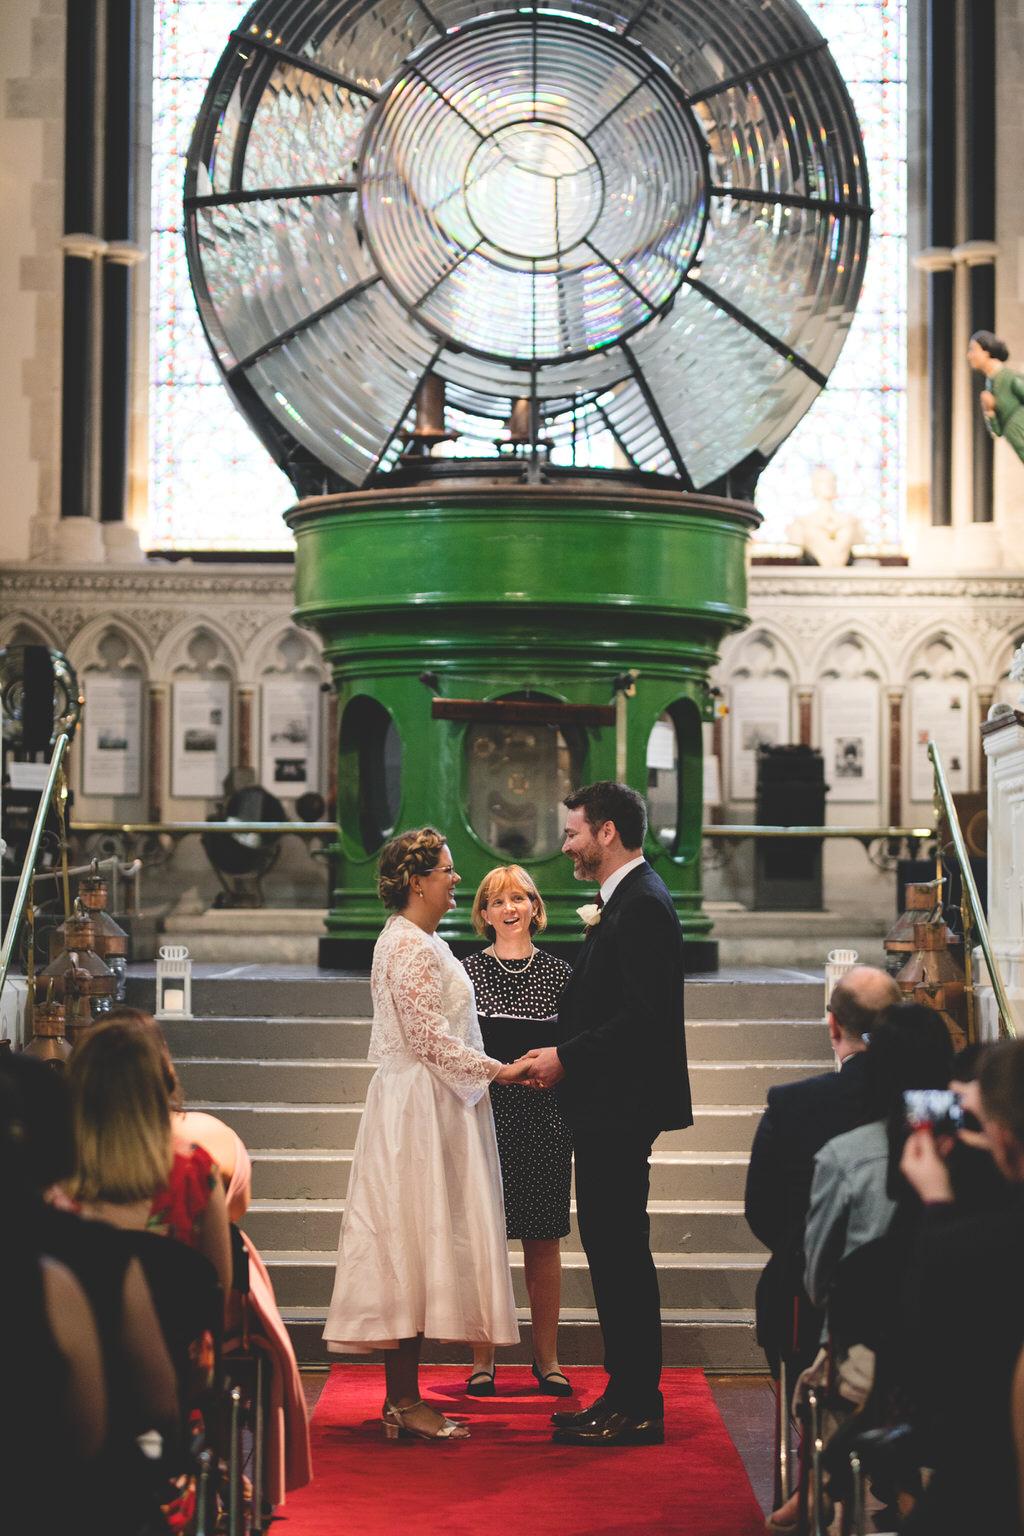 Cool, alternative wedding ceremony location